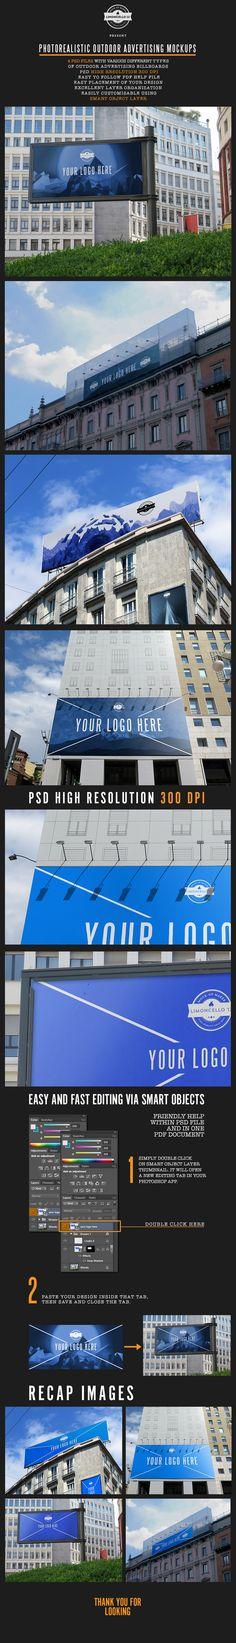 Outdoor Advertising Mockups on Behance